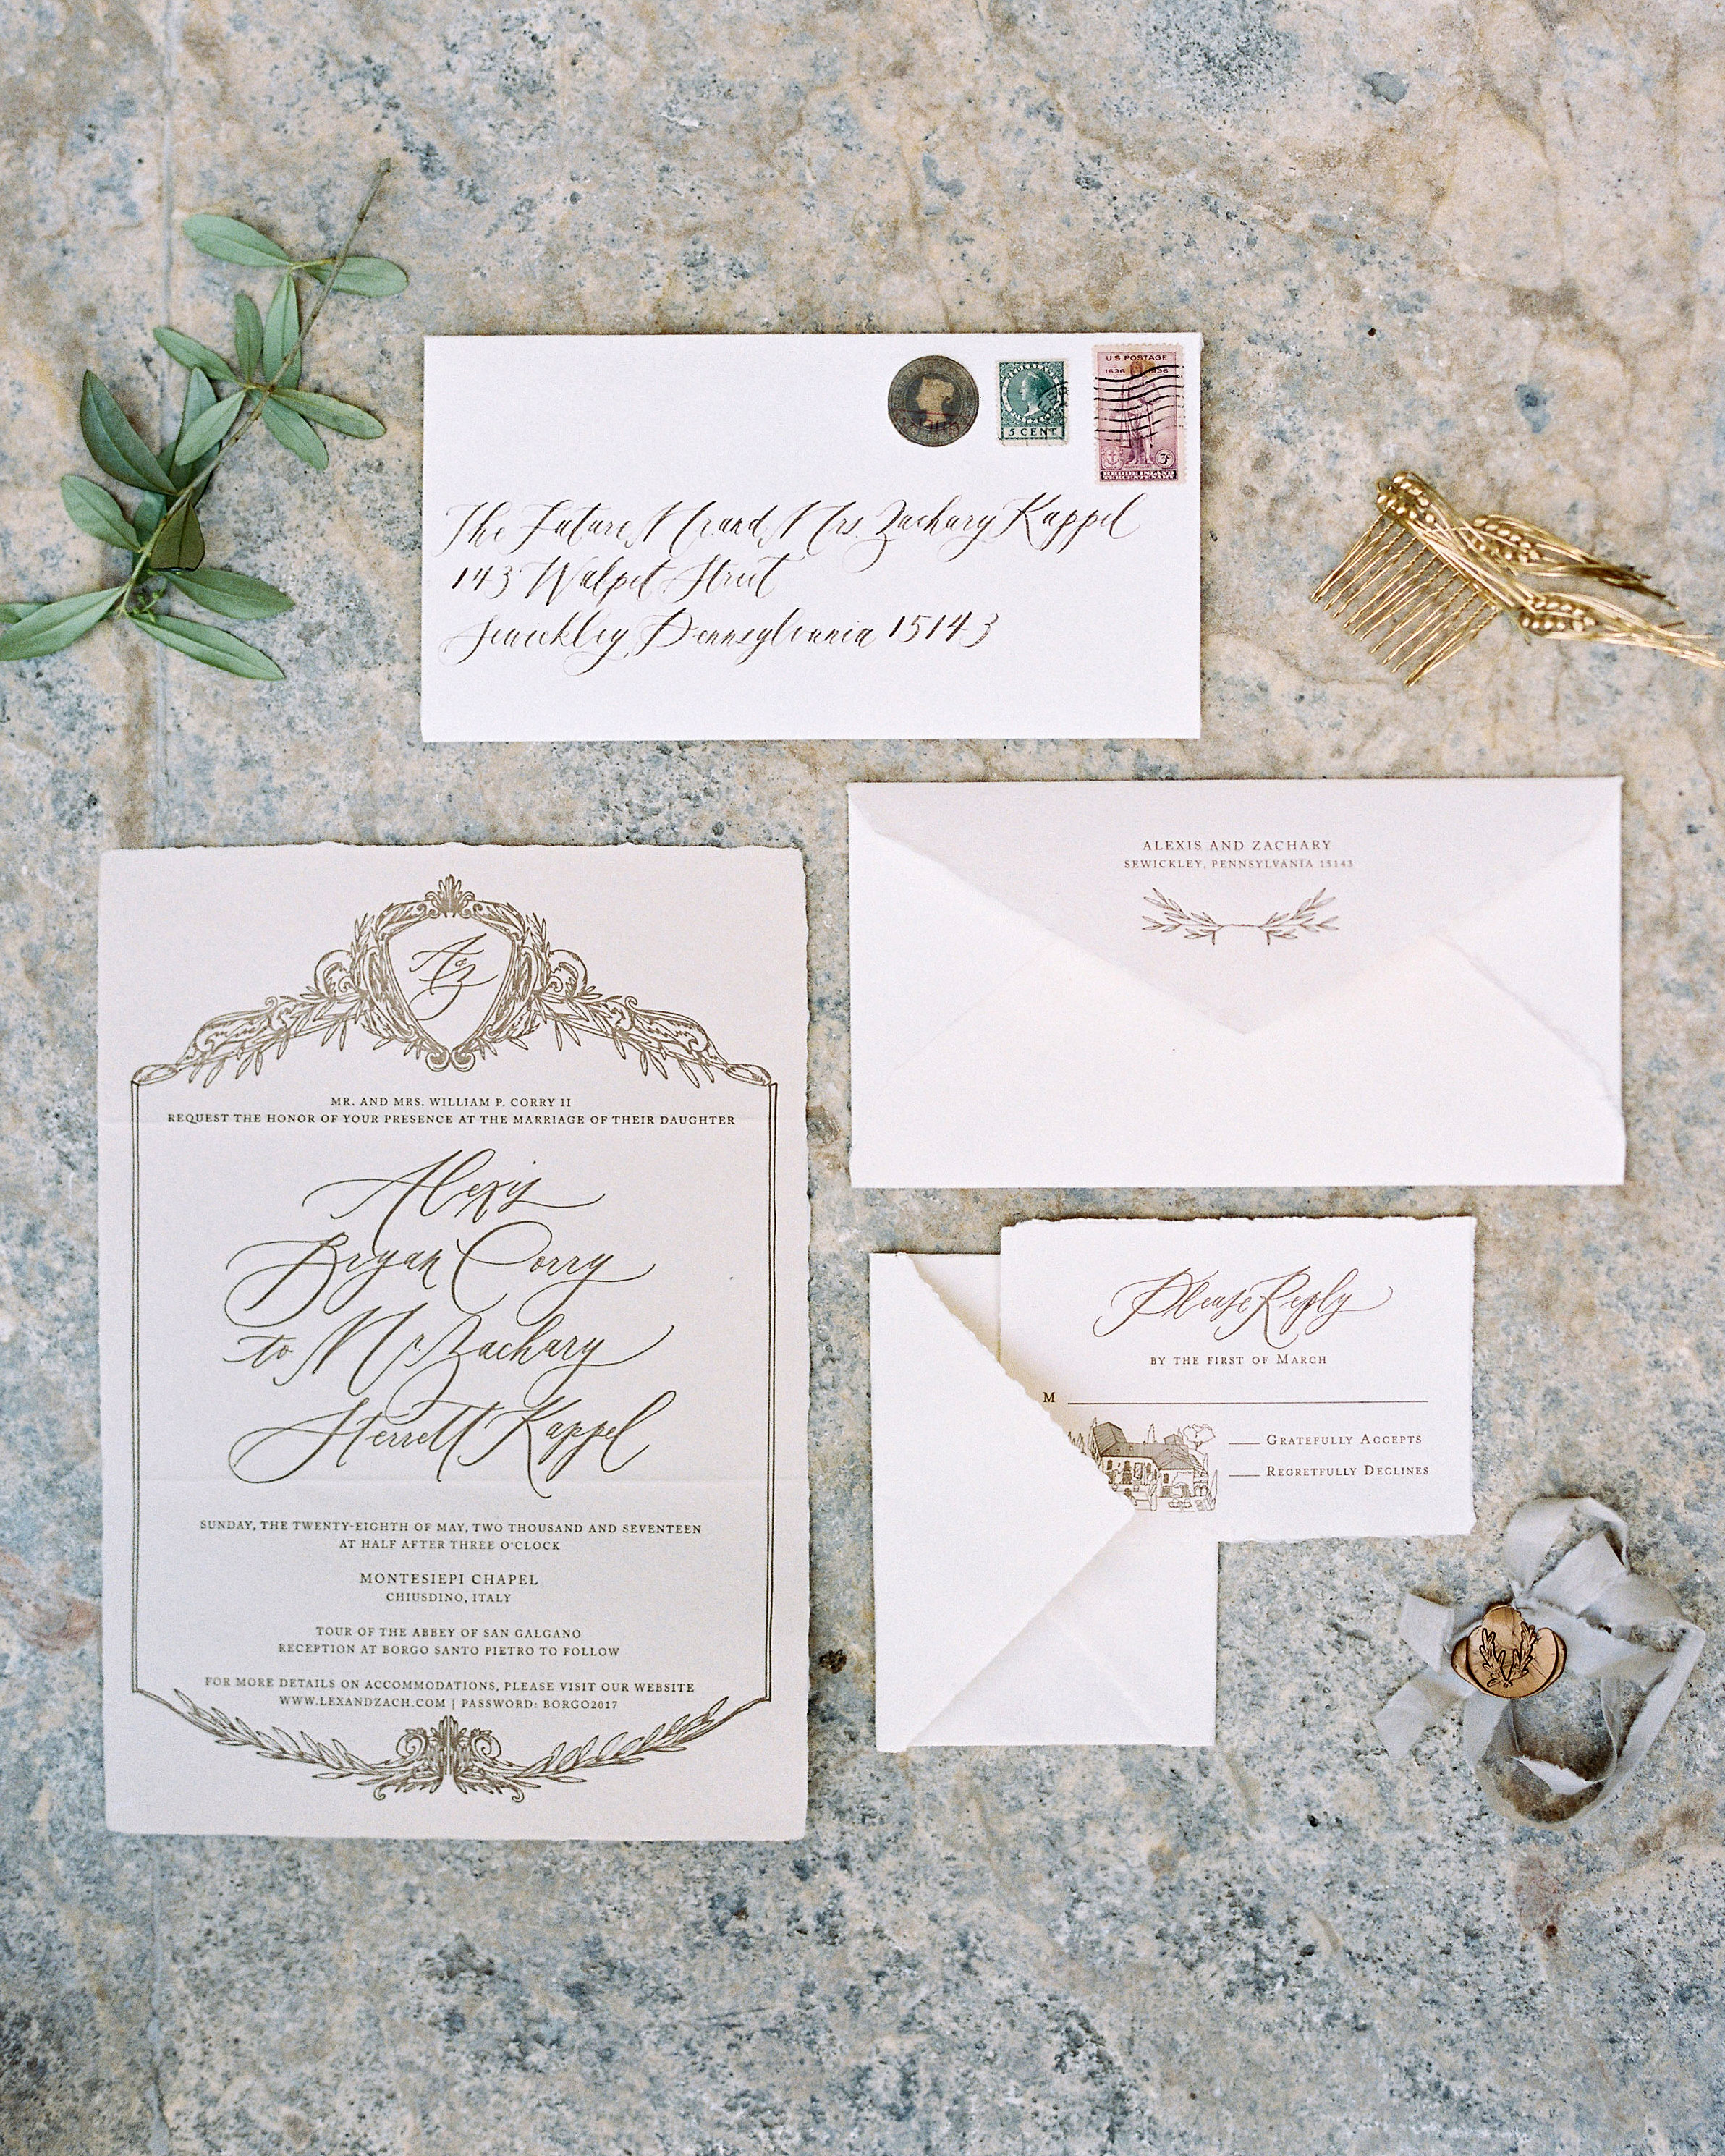 alexis zach wedding italy invitation